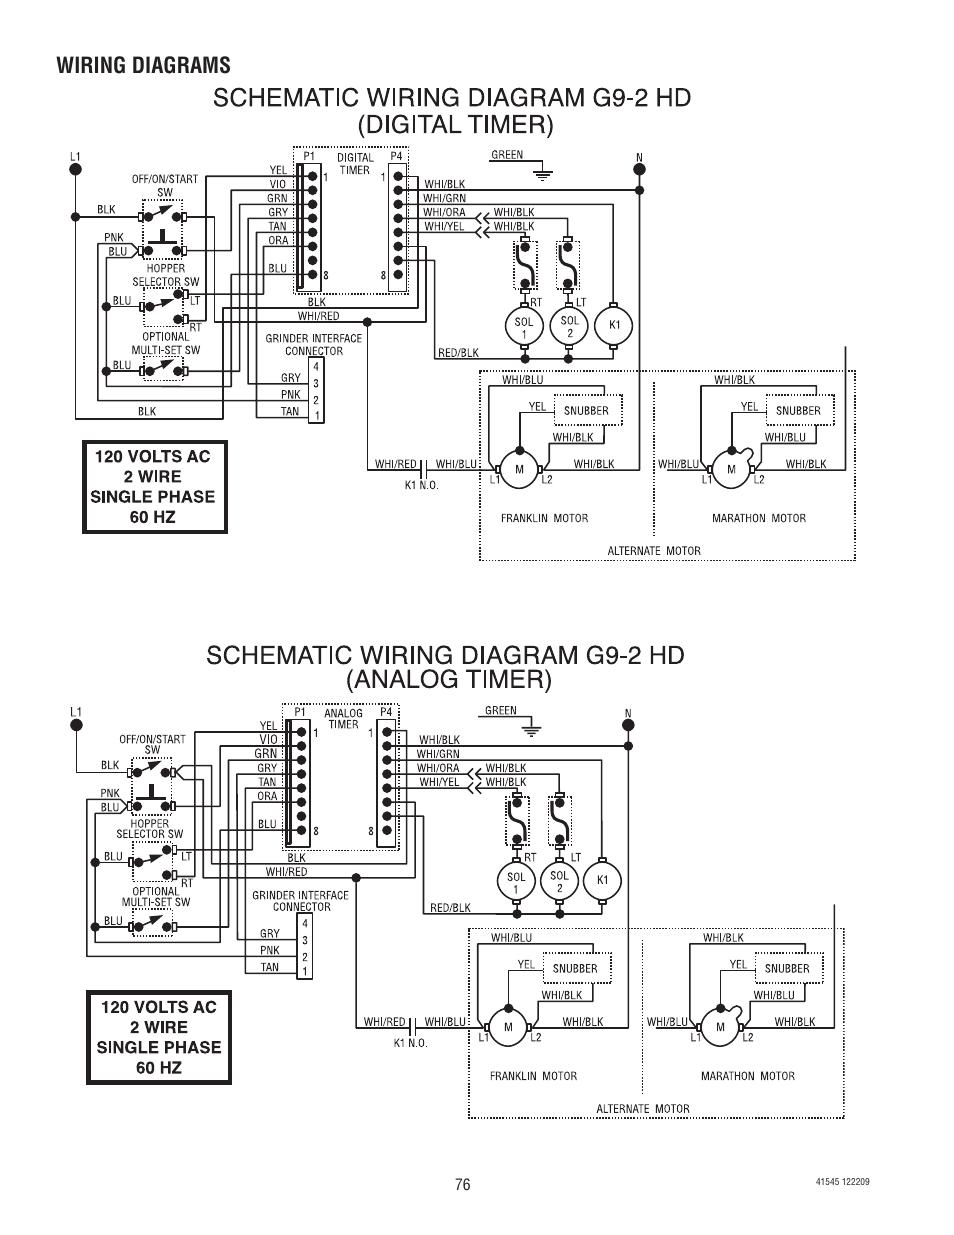 medium resolution of  bunn g9 2t dbc page76 g9 wiring diagram lighting diagrams honda motorcycle repair at cita